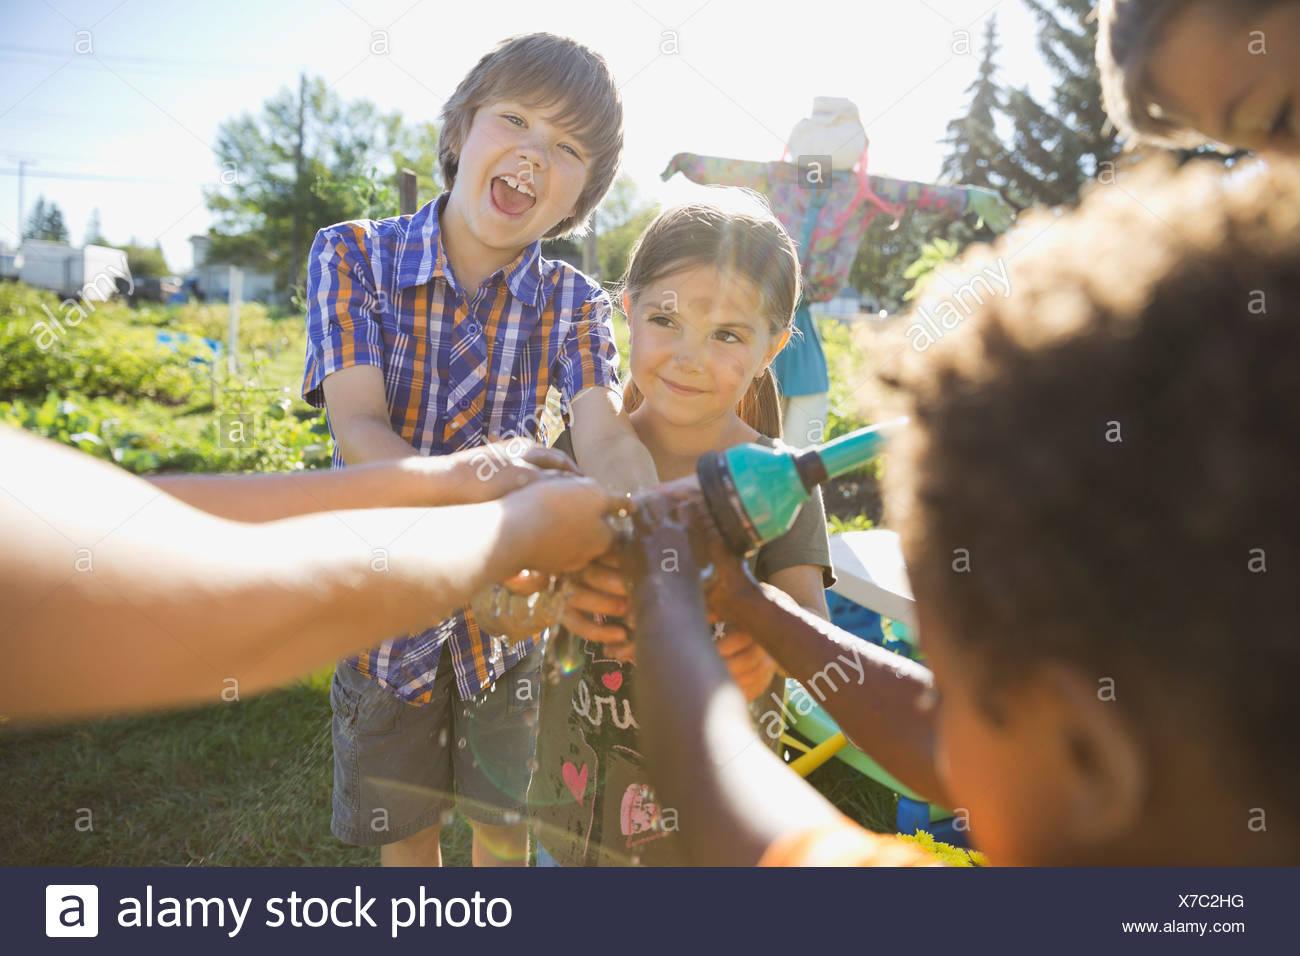 I bambini lavarsi le mani insieme con tubo flessibile da giardino Immagini Stock